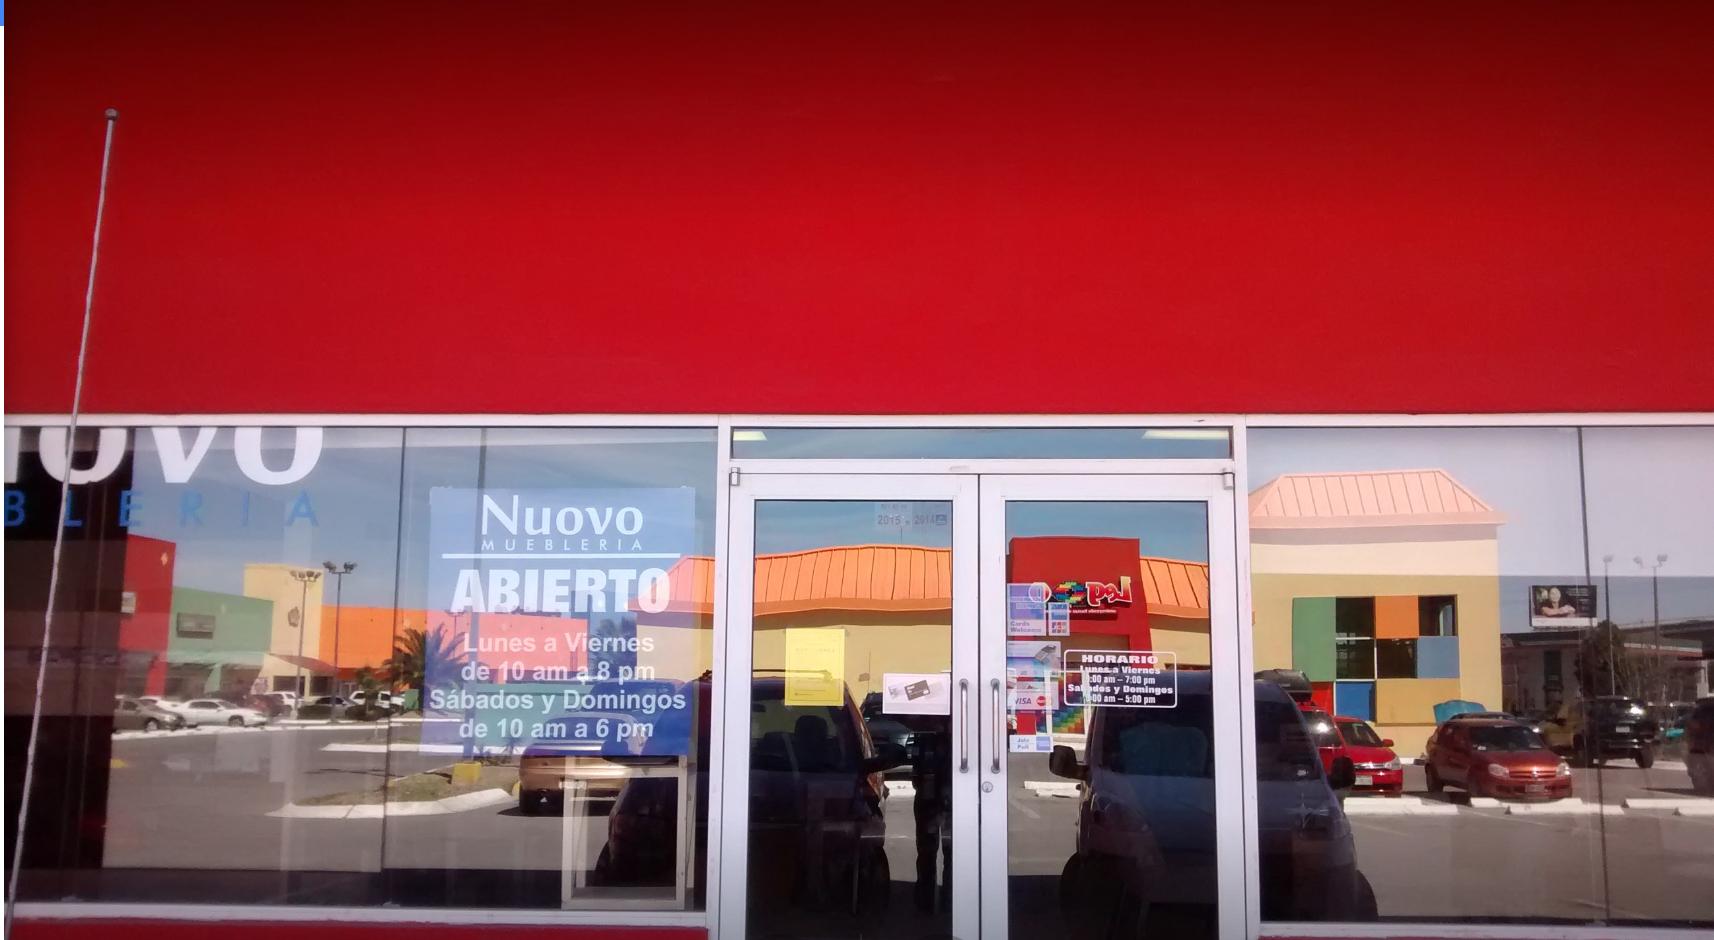 Profeco Suspendi A Utopica Nuovo Elektra Y Famsa Puente Libre # Muebles Nuovo Cd Juarez